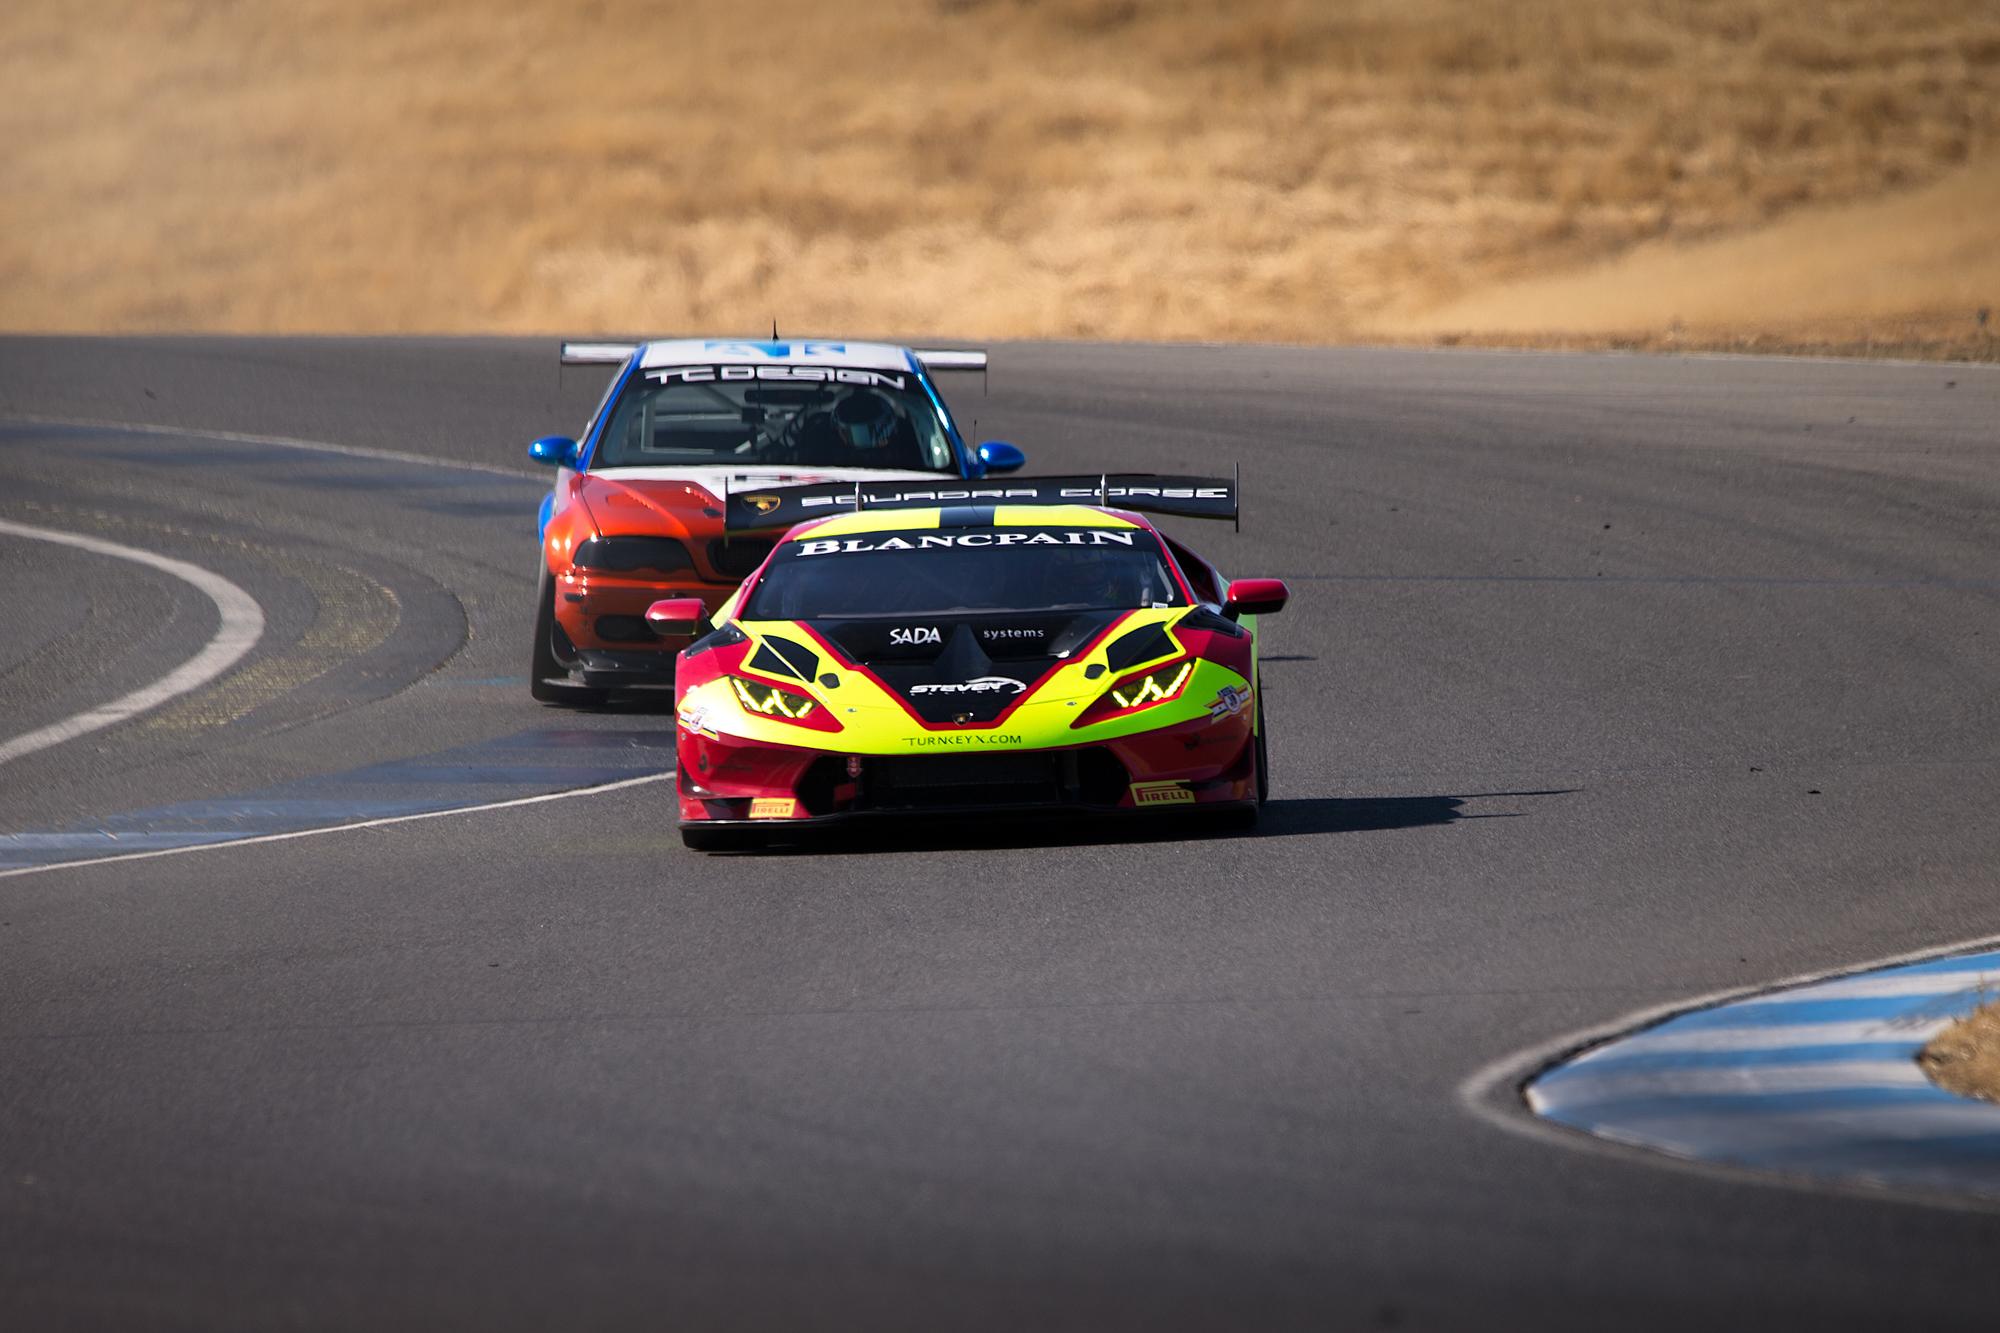 Steven-Racing-20171005-44474.jpg